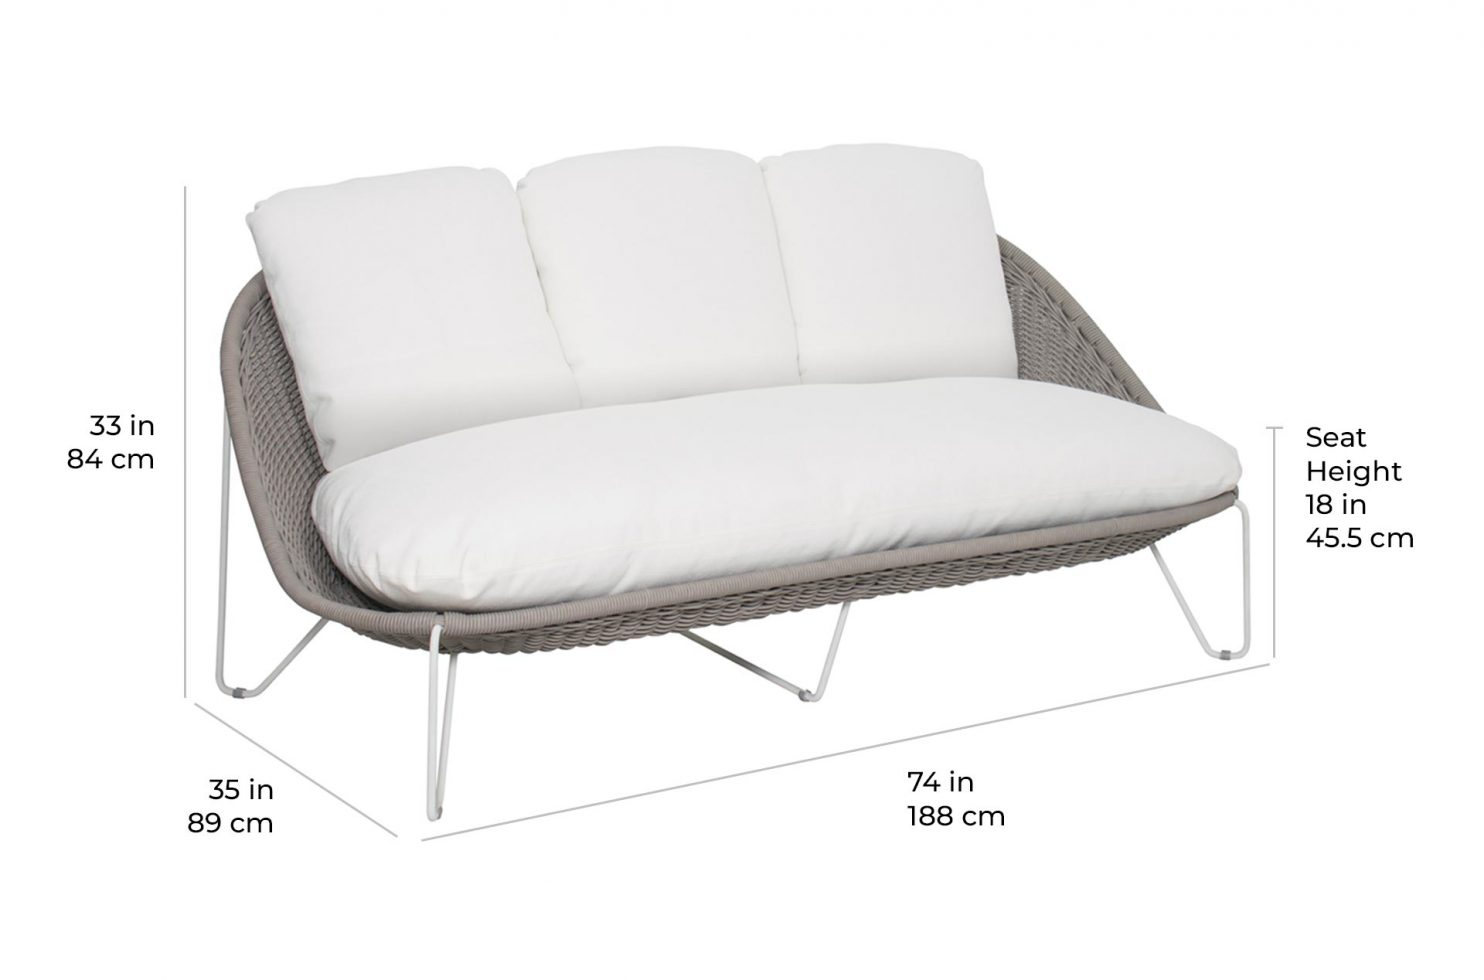 arch aegean sofa 620FT021P2 scale dims